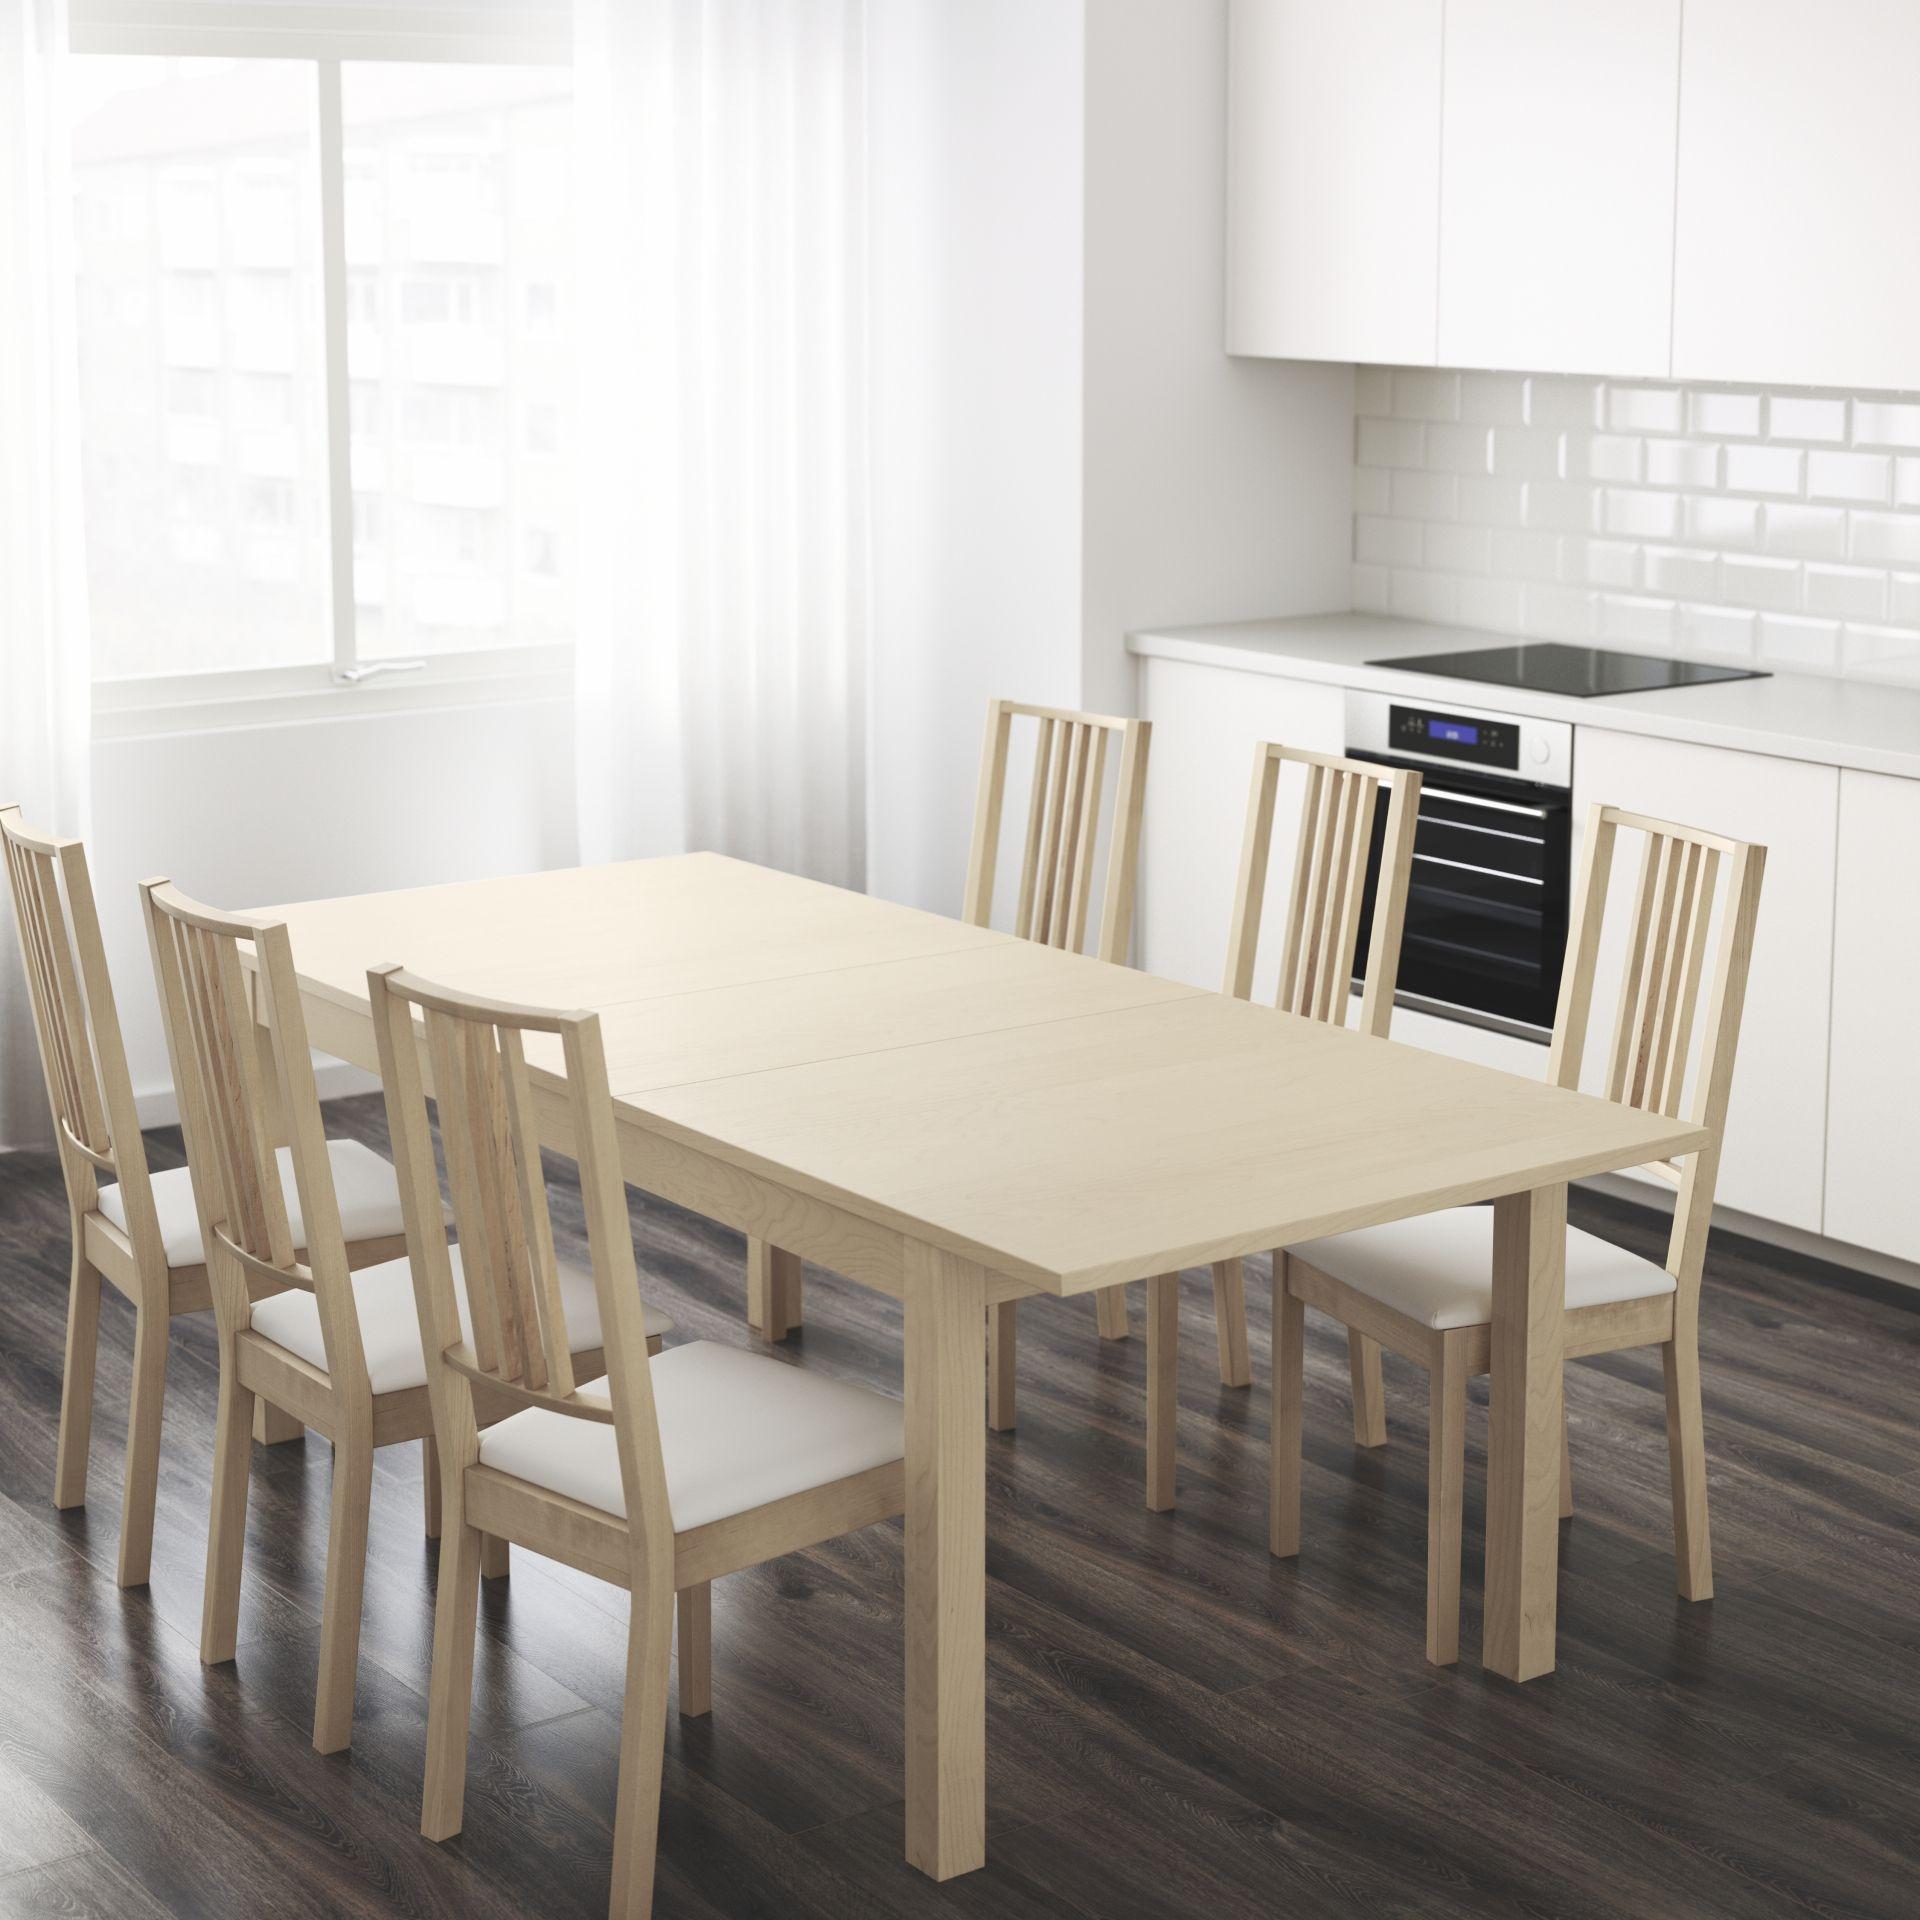 Ikea Bjursta Tafel Uitschuifbaar.Nederland Allon Designdroom Tafel Ikea Eettafel En